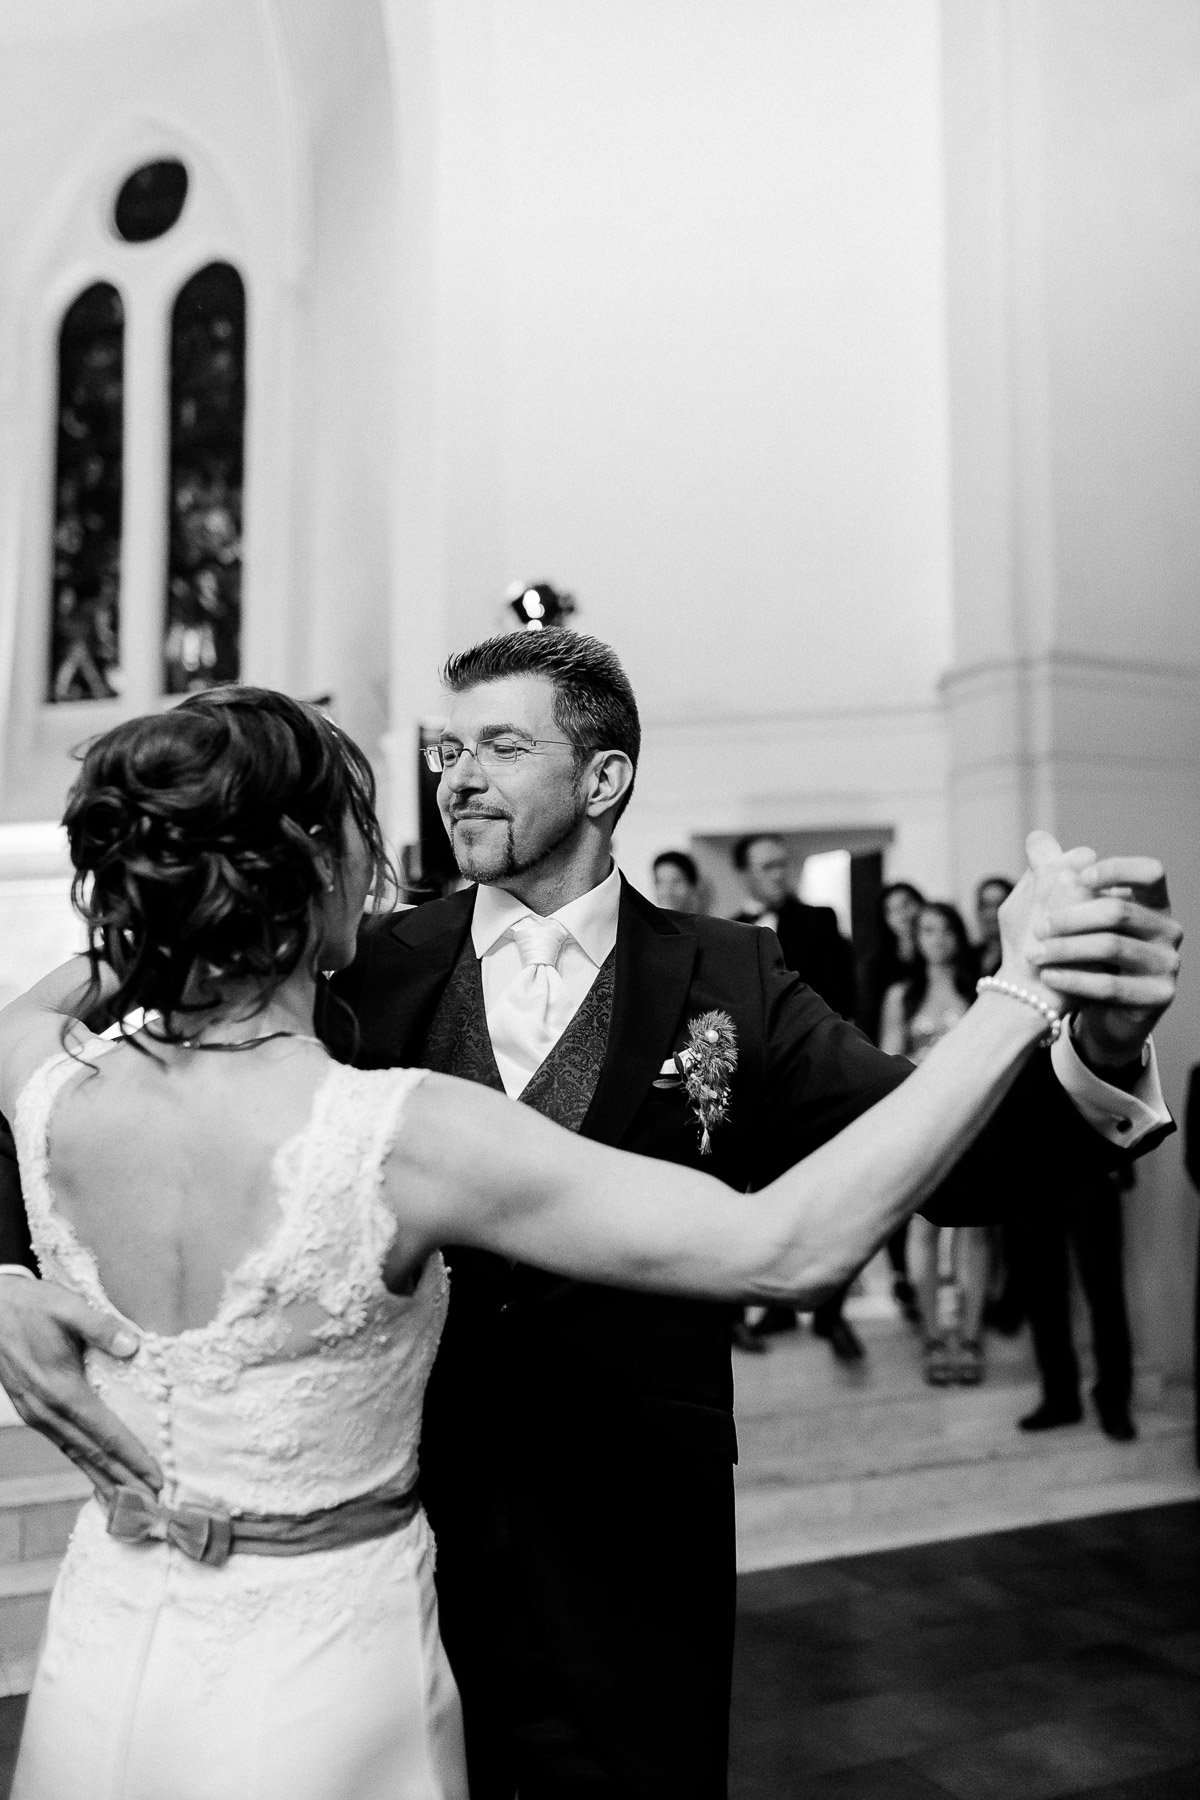 Hochzeitsfotograf-Bielefeld-2015-05-52